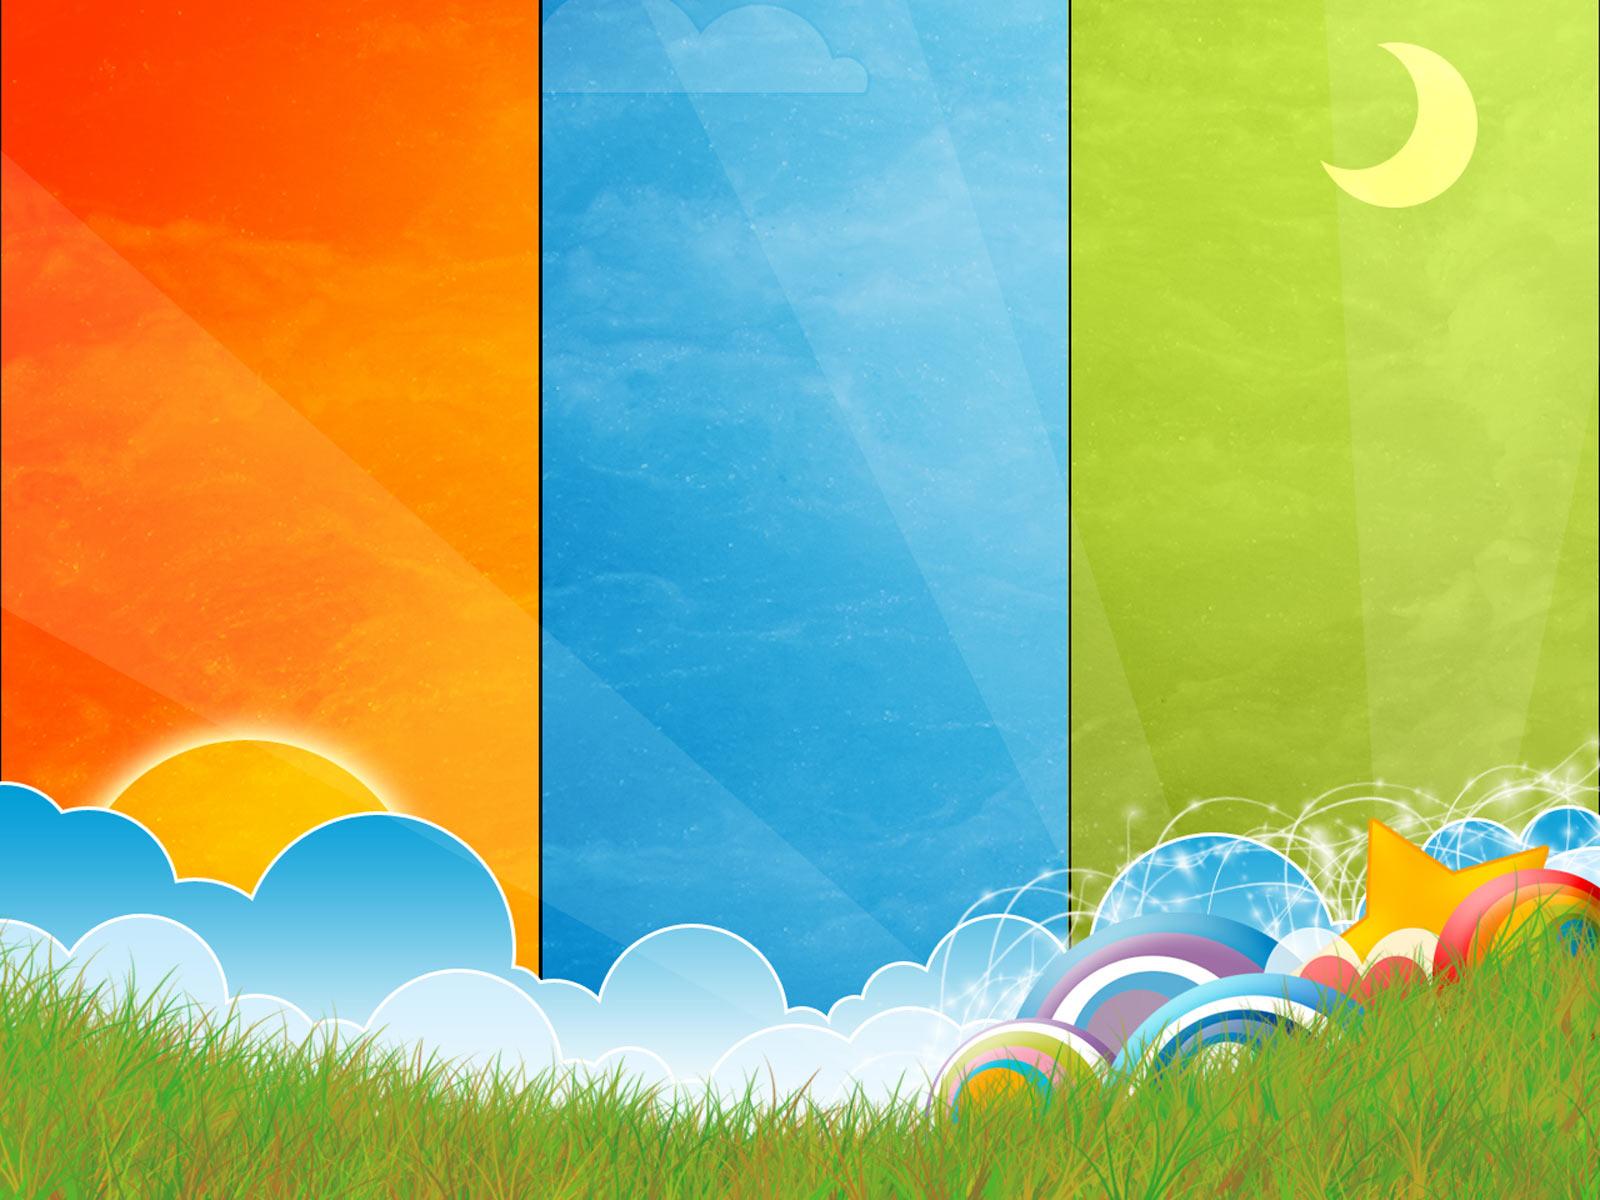 WebsiteTemplatesbz blog Colorful Desktop Wallpapers 1600x1200